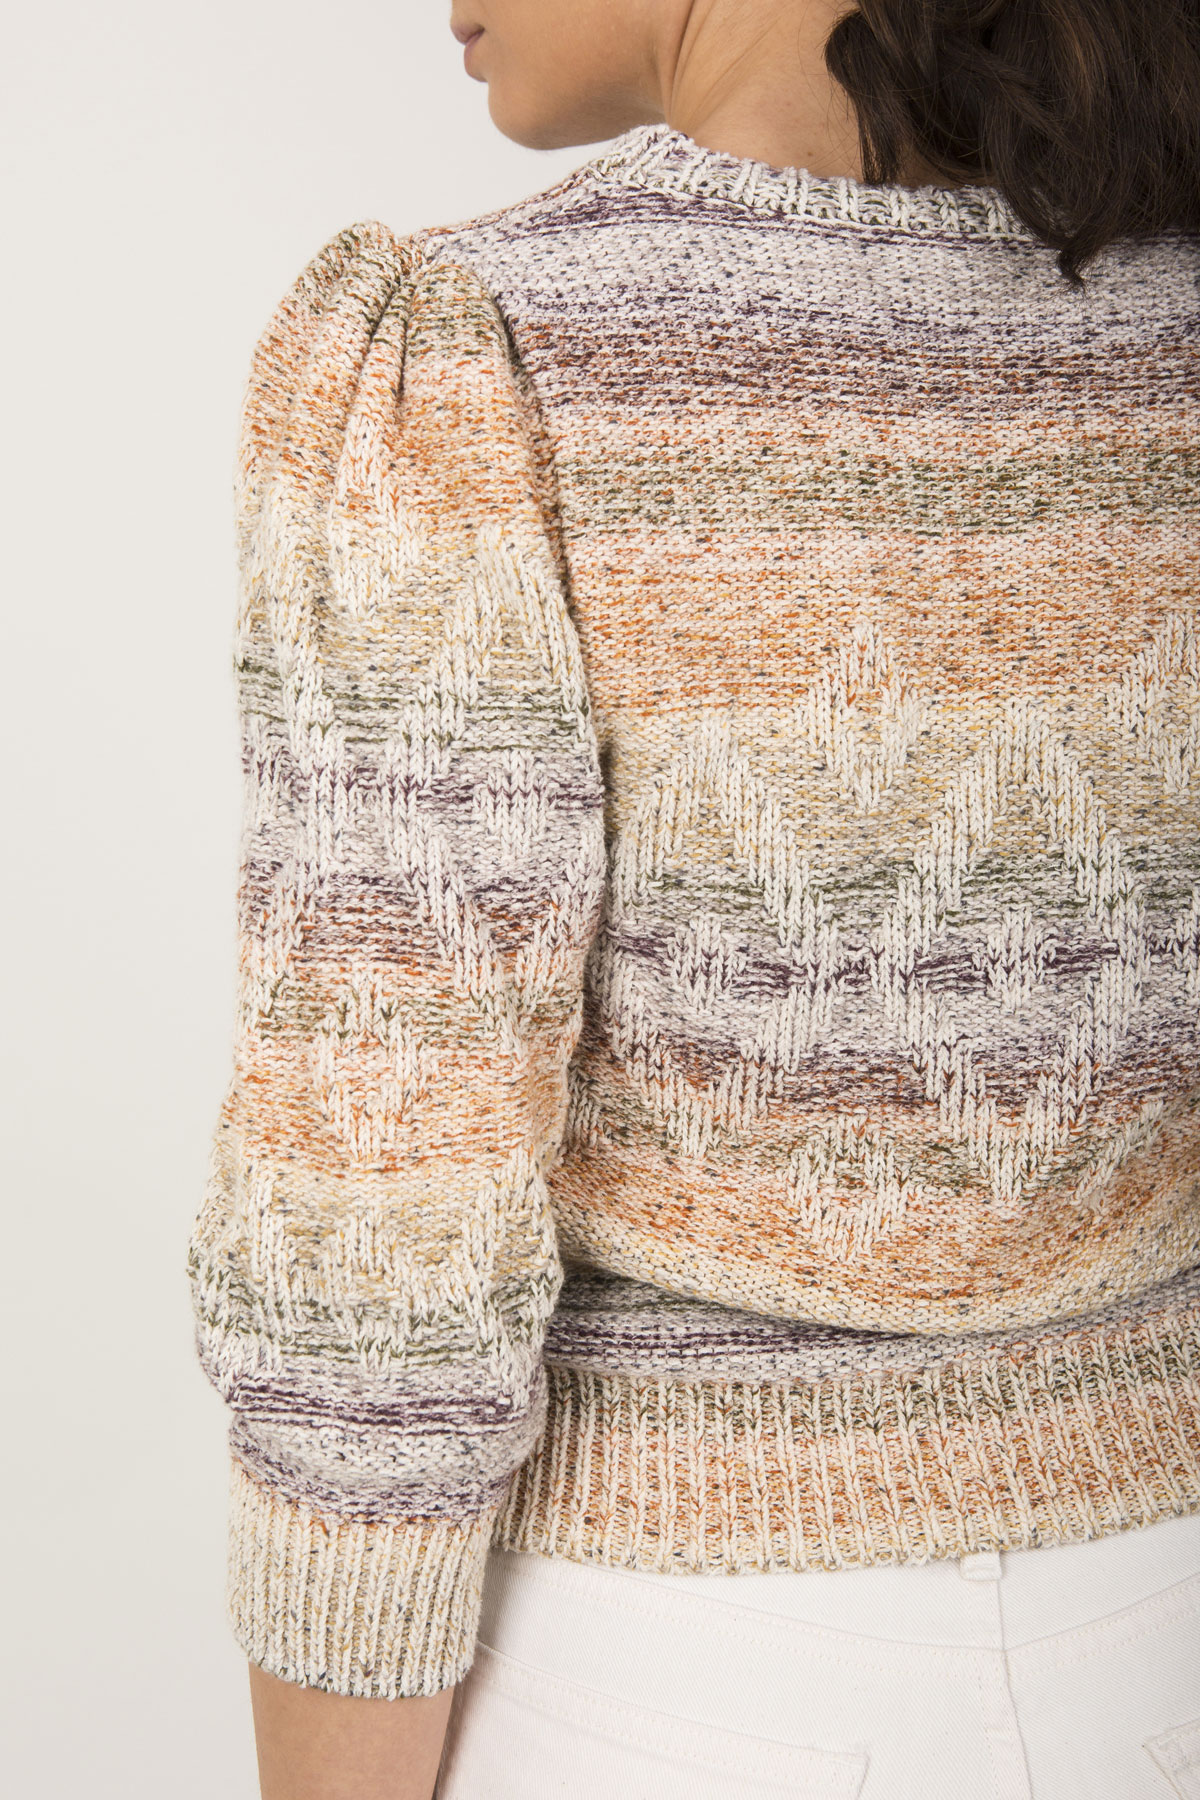 sweater-vanessabruno